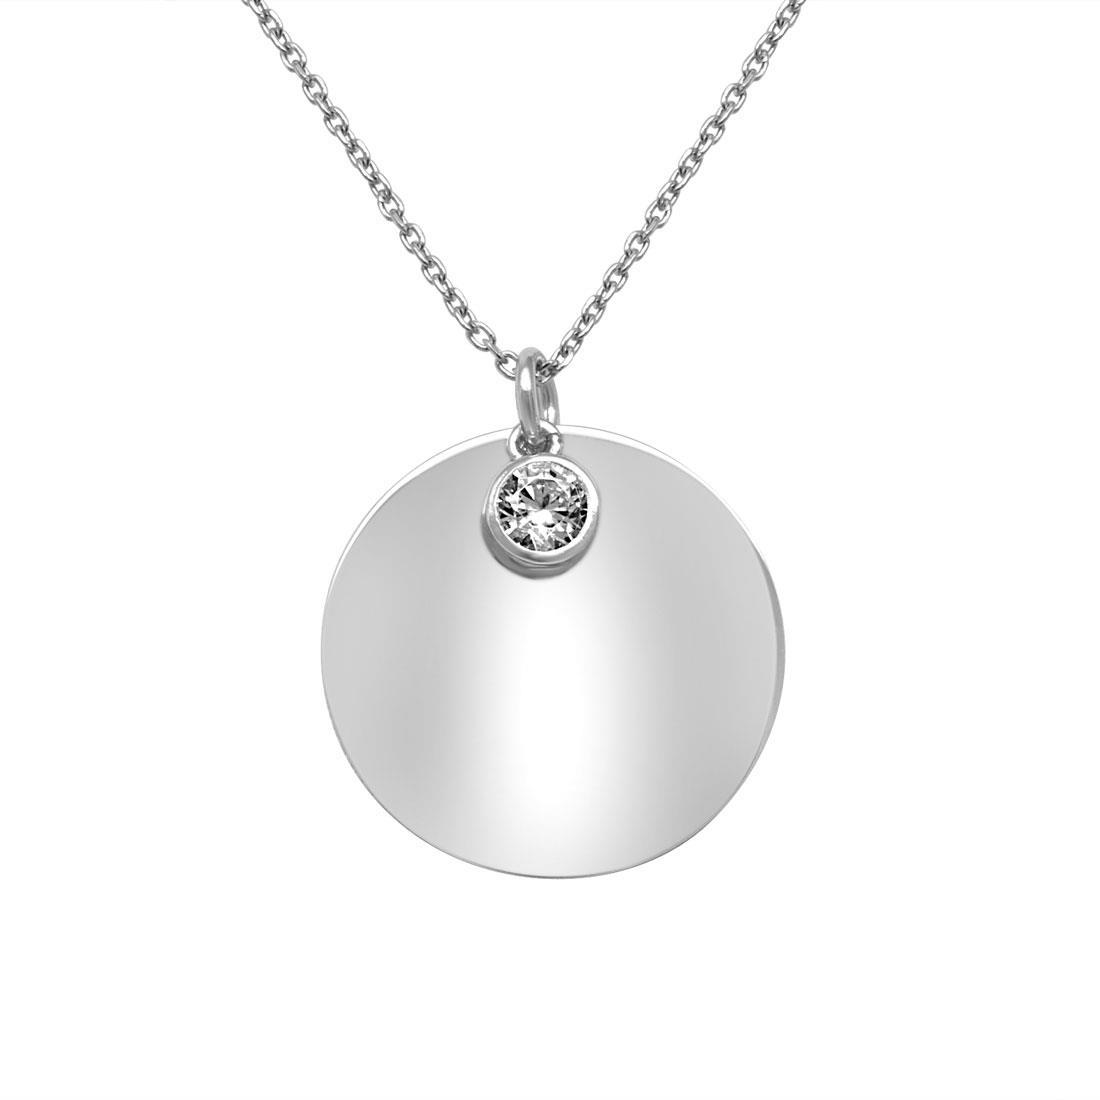 Collana in argento con zircone - ORO&CO